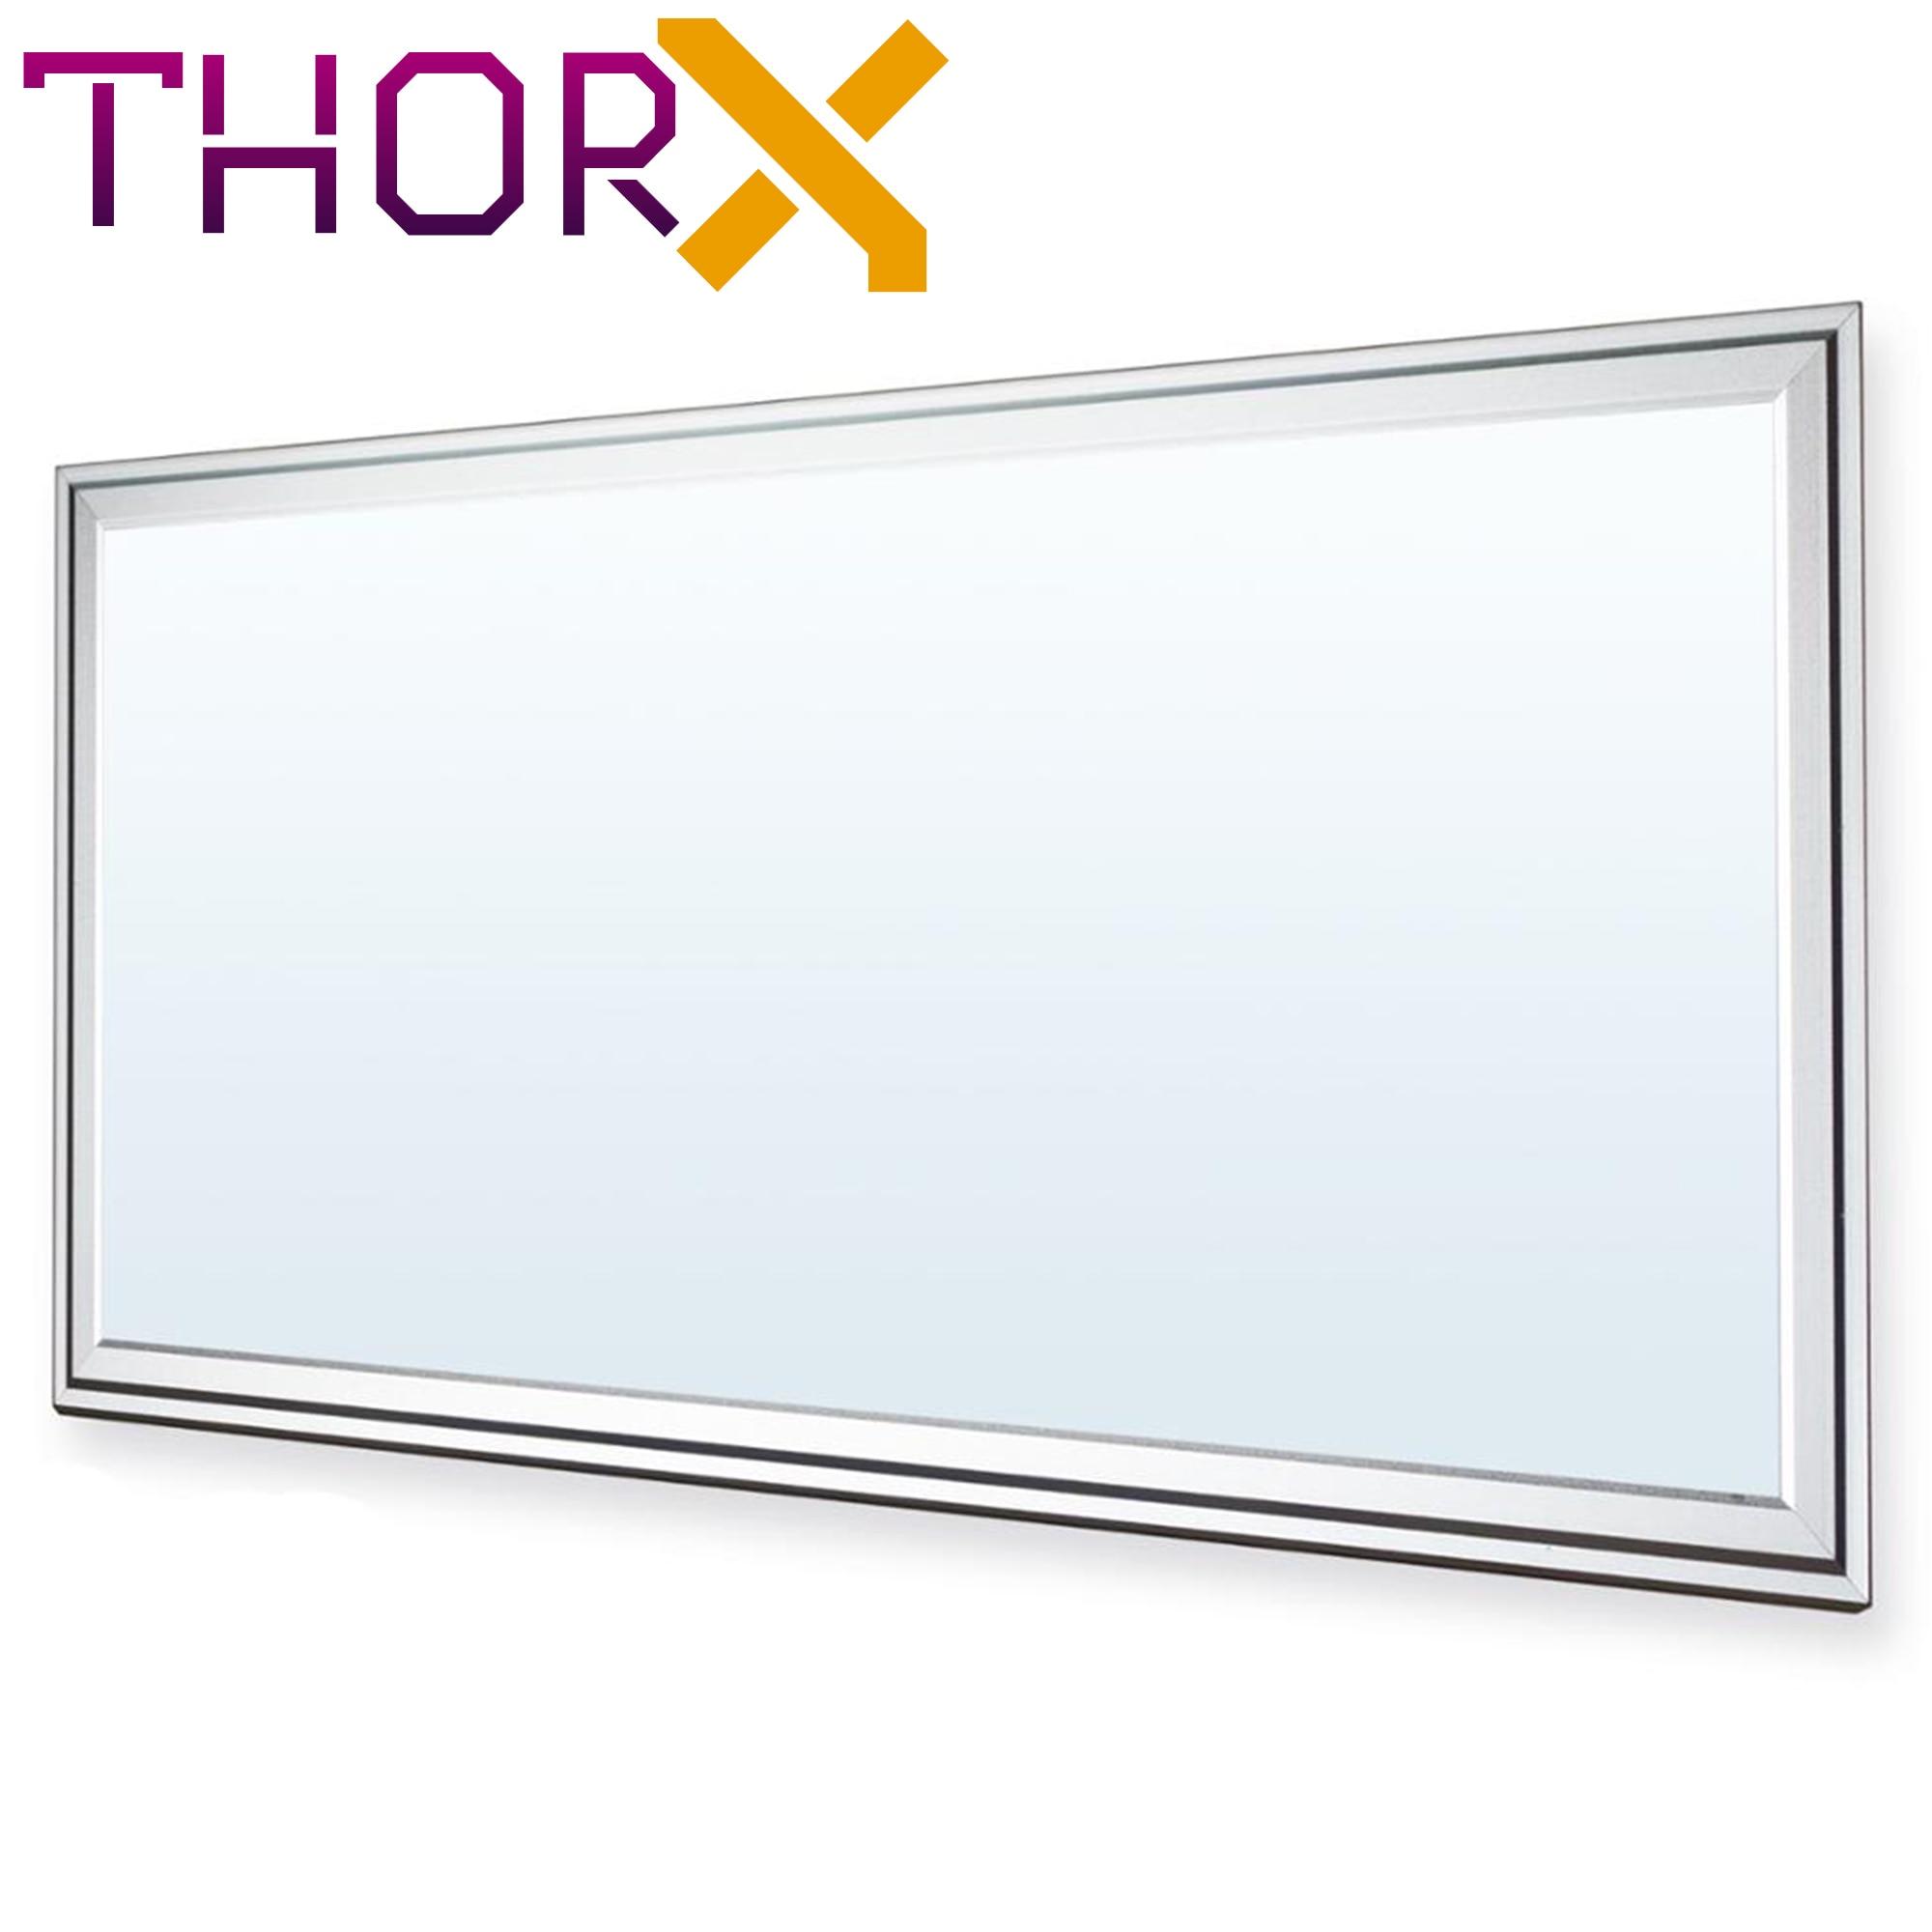 ThorX 60x30 Cm Ultraslim LED Panel  - 20 W, 1600Lm Ceiling Light Led Driver 100-240V Cold/warm/neutral Japan Korea Fast Shipping